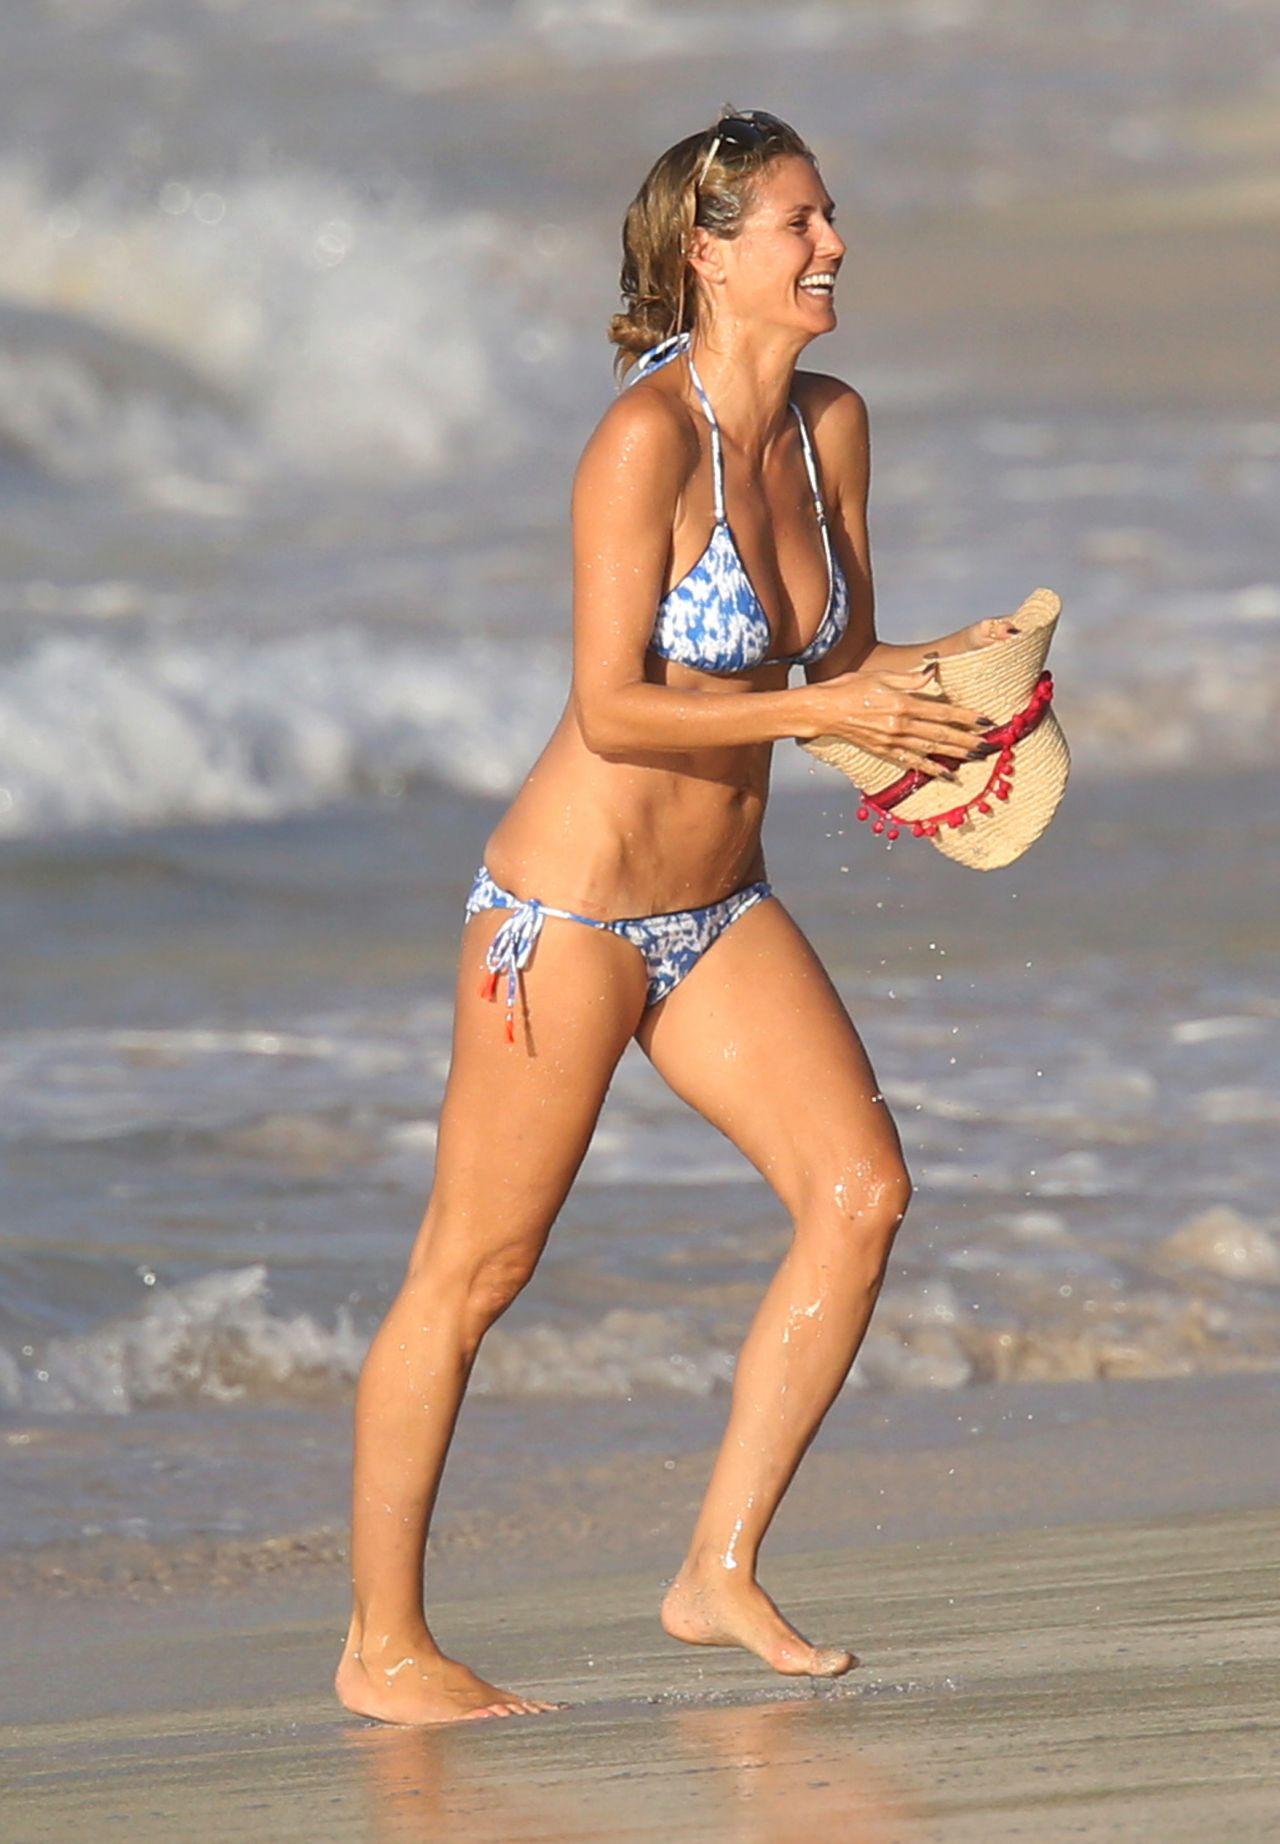 Heidi Klum In Bikini - Beach In The Caribbean 872016-2399